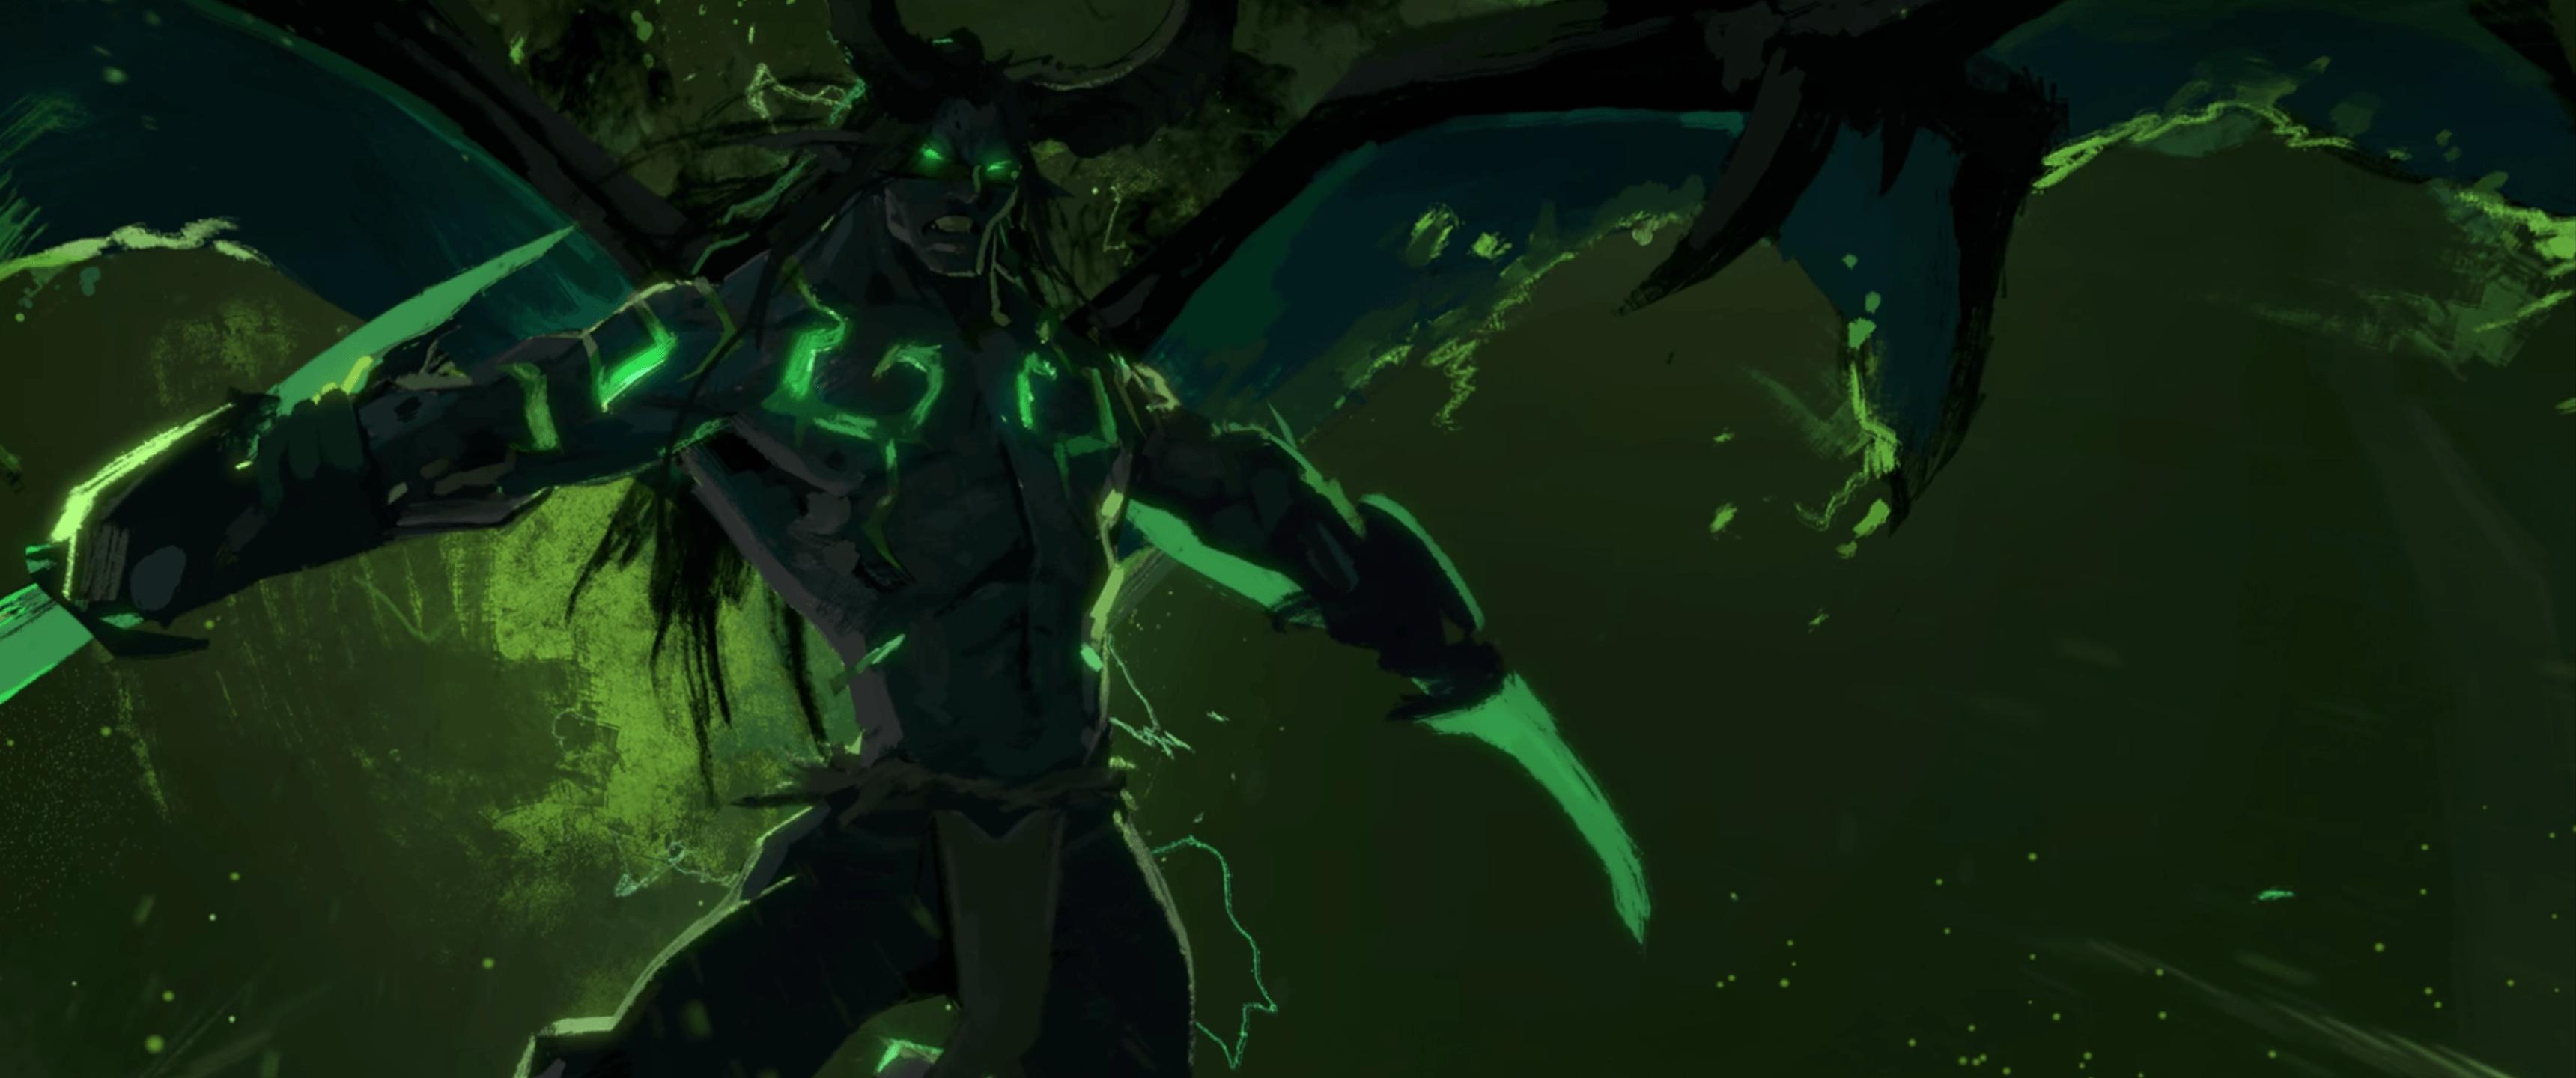 Jungle Wallpaper World Of Warcraft: Demon Hunter Wallpapers